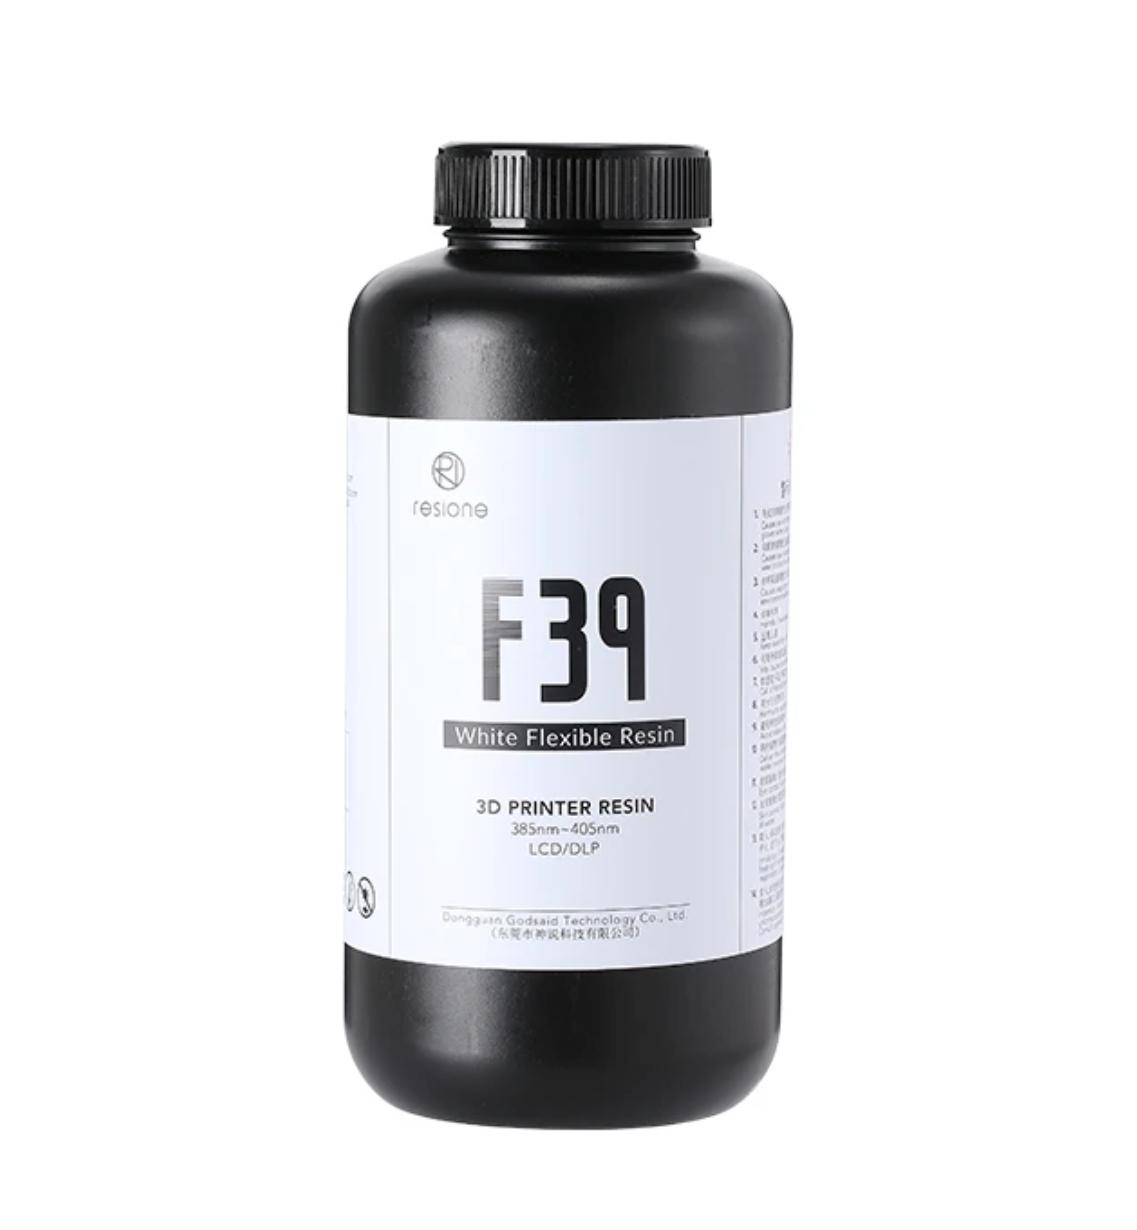 Resione F39 White Flexible Rubber-like 3D Printer Resin 500g